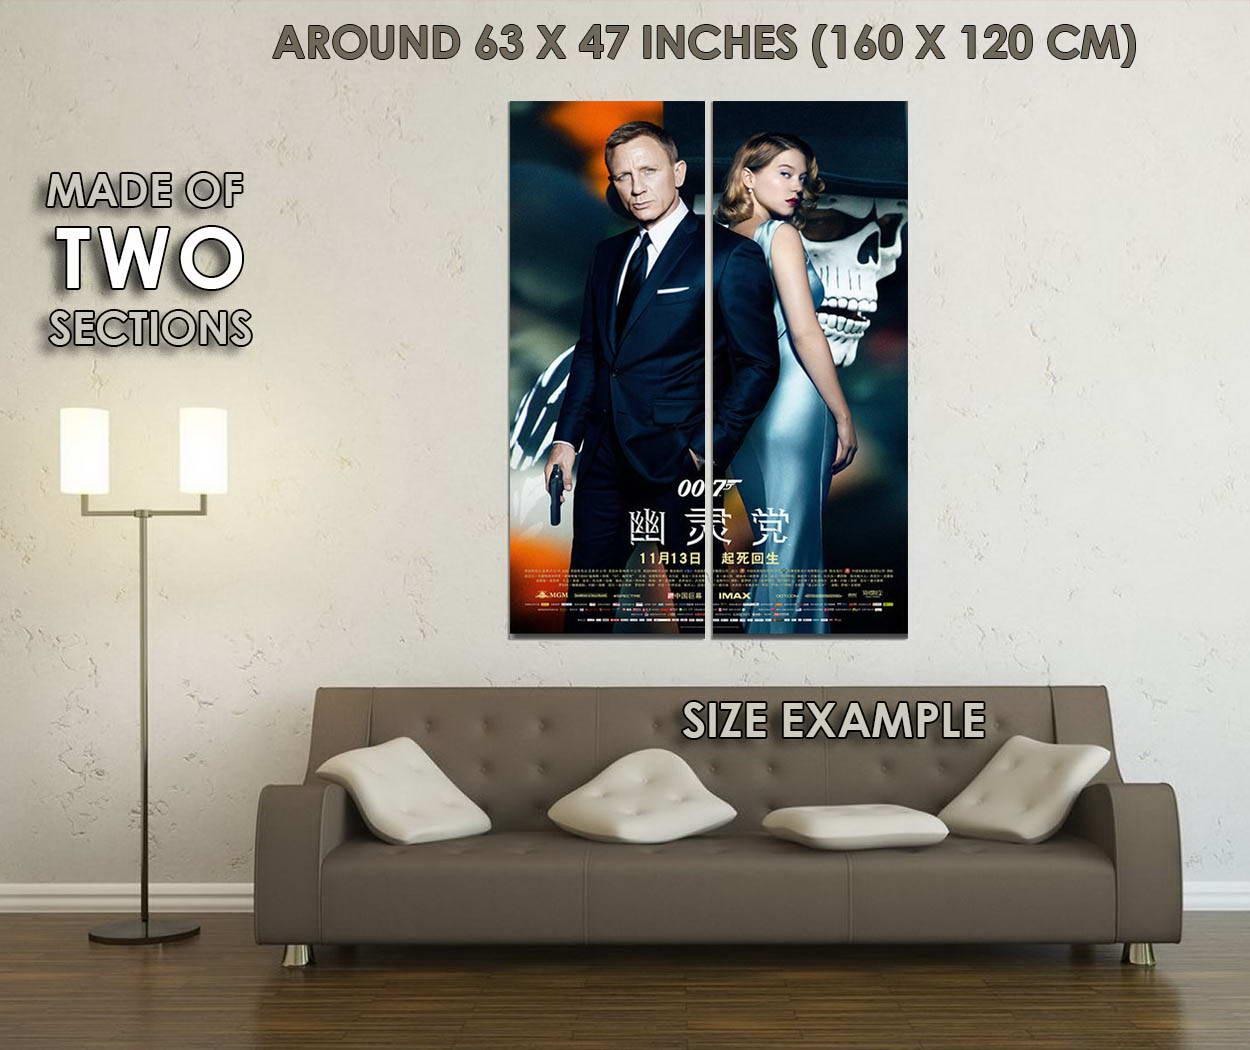 10785-James-Bond-24-Spectre-2-Mo-Art-LAMINATED-POSTER-CA thumbnail 6